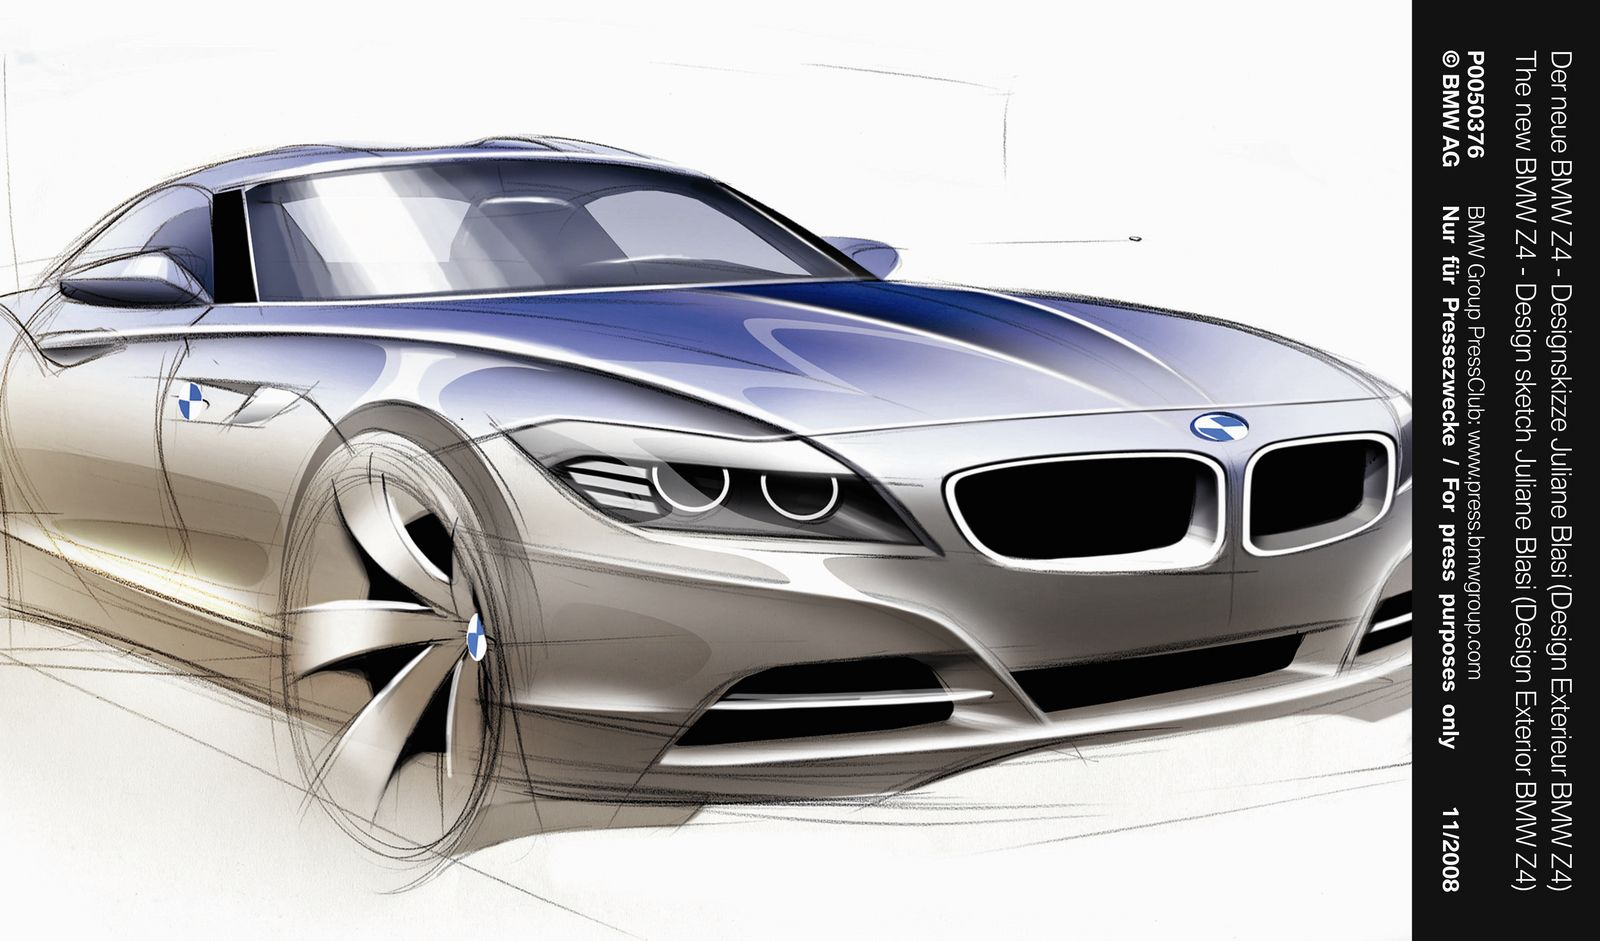 History: BMW car designers – Episode 2